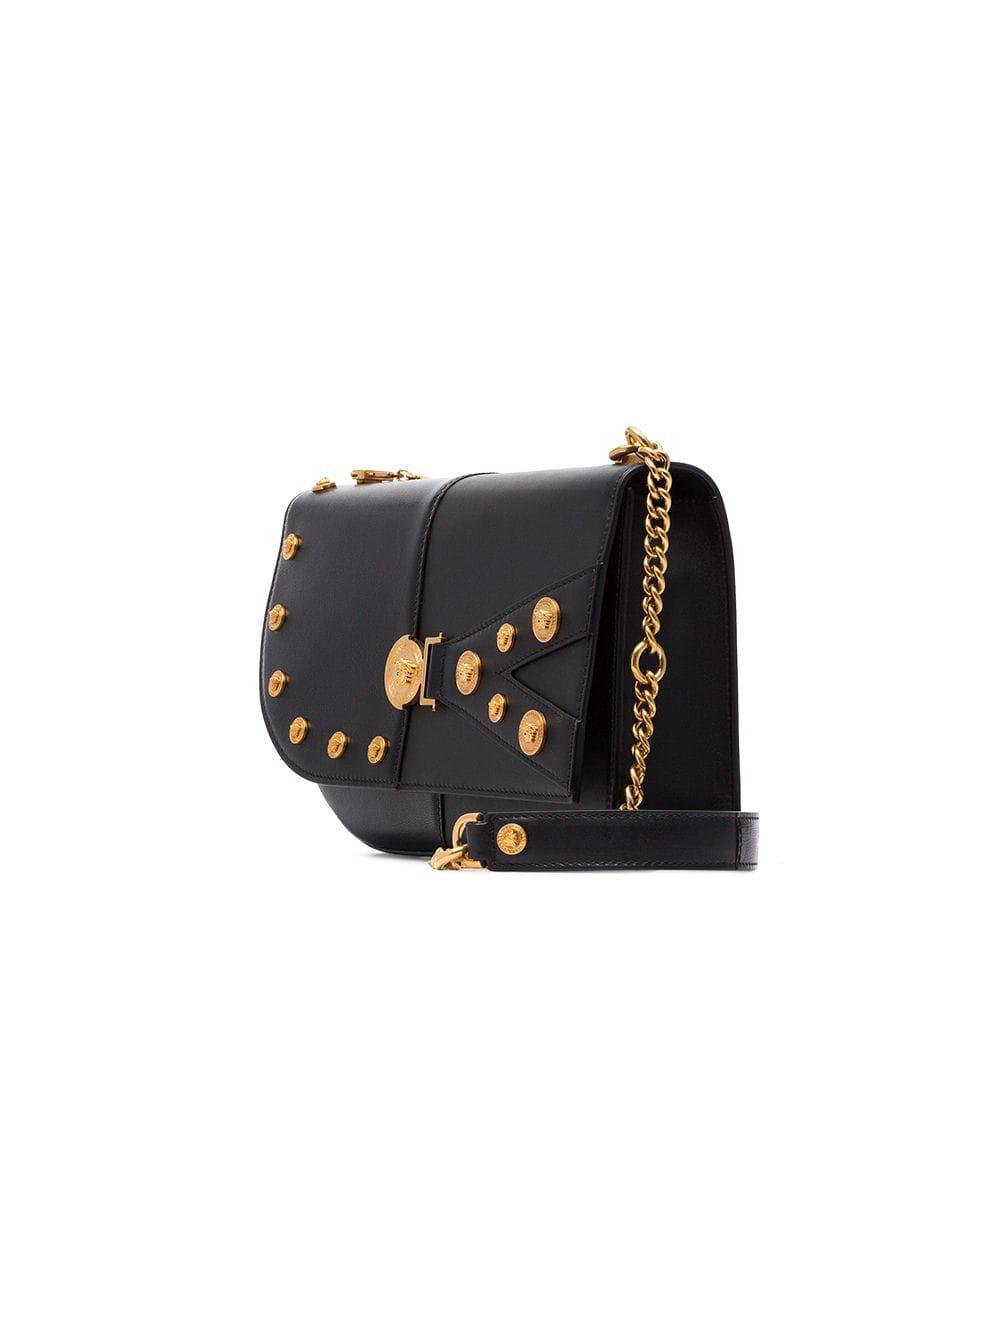 Versace - Black Studded Leather Shoulder Bag - Lyst. View fullscreen 58576ea304577